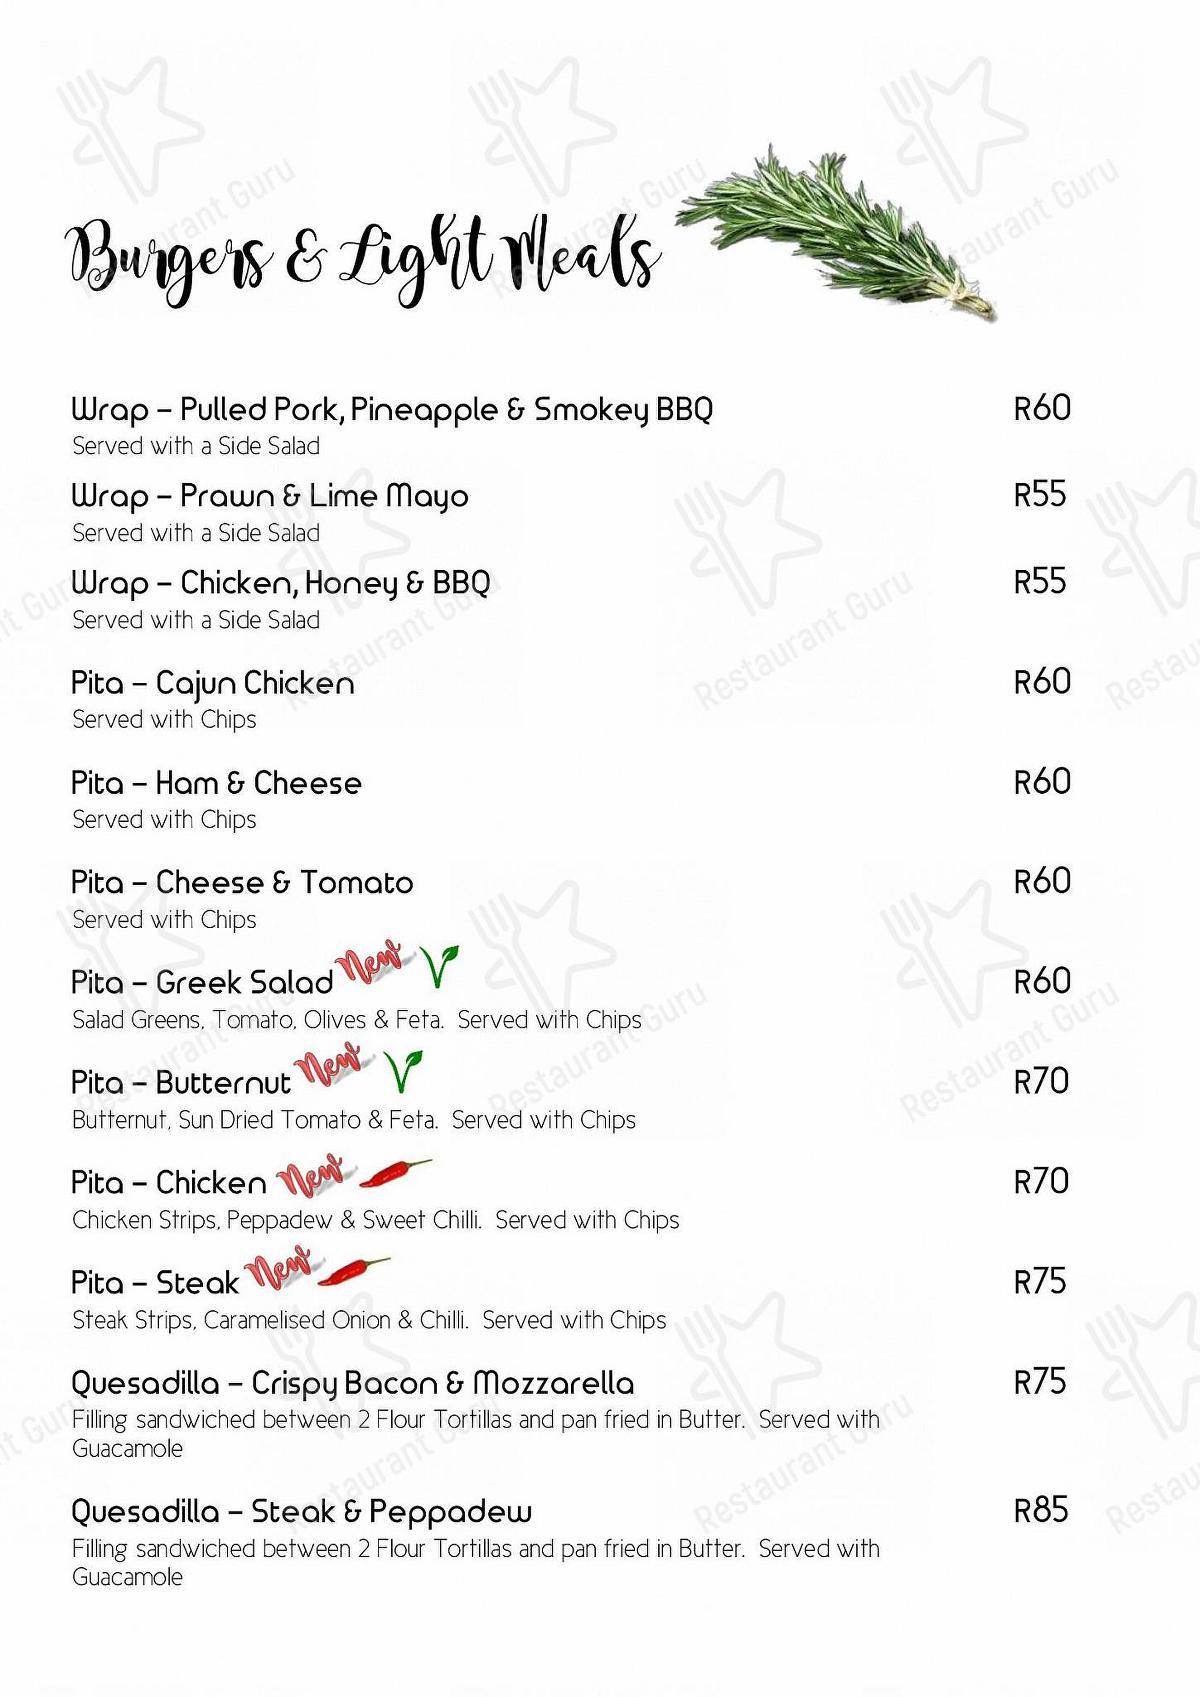 Steve's Pub & Restaurant menu - meals and drinks